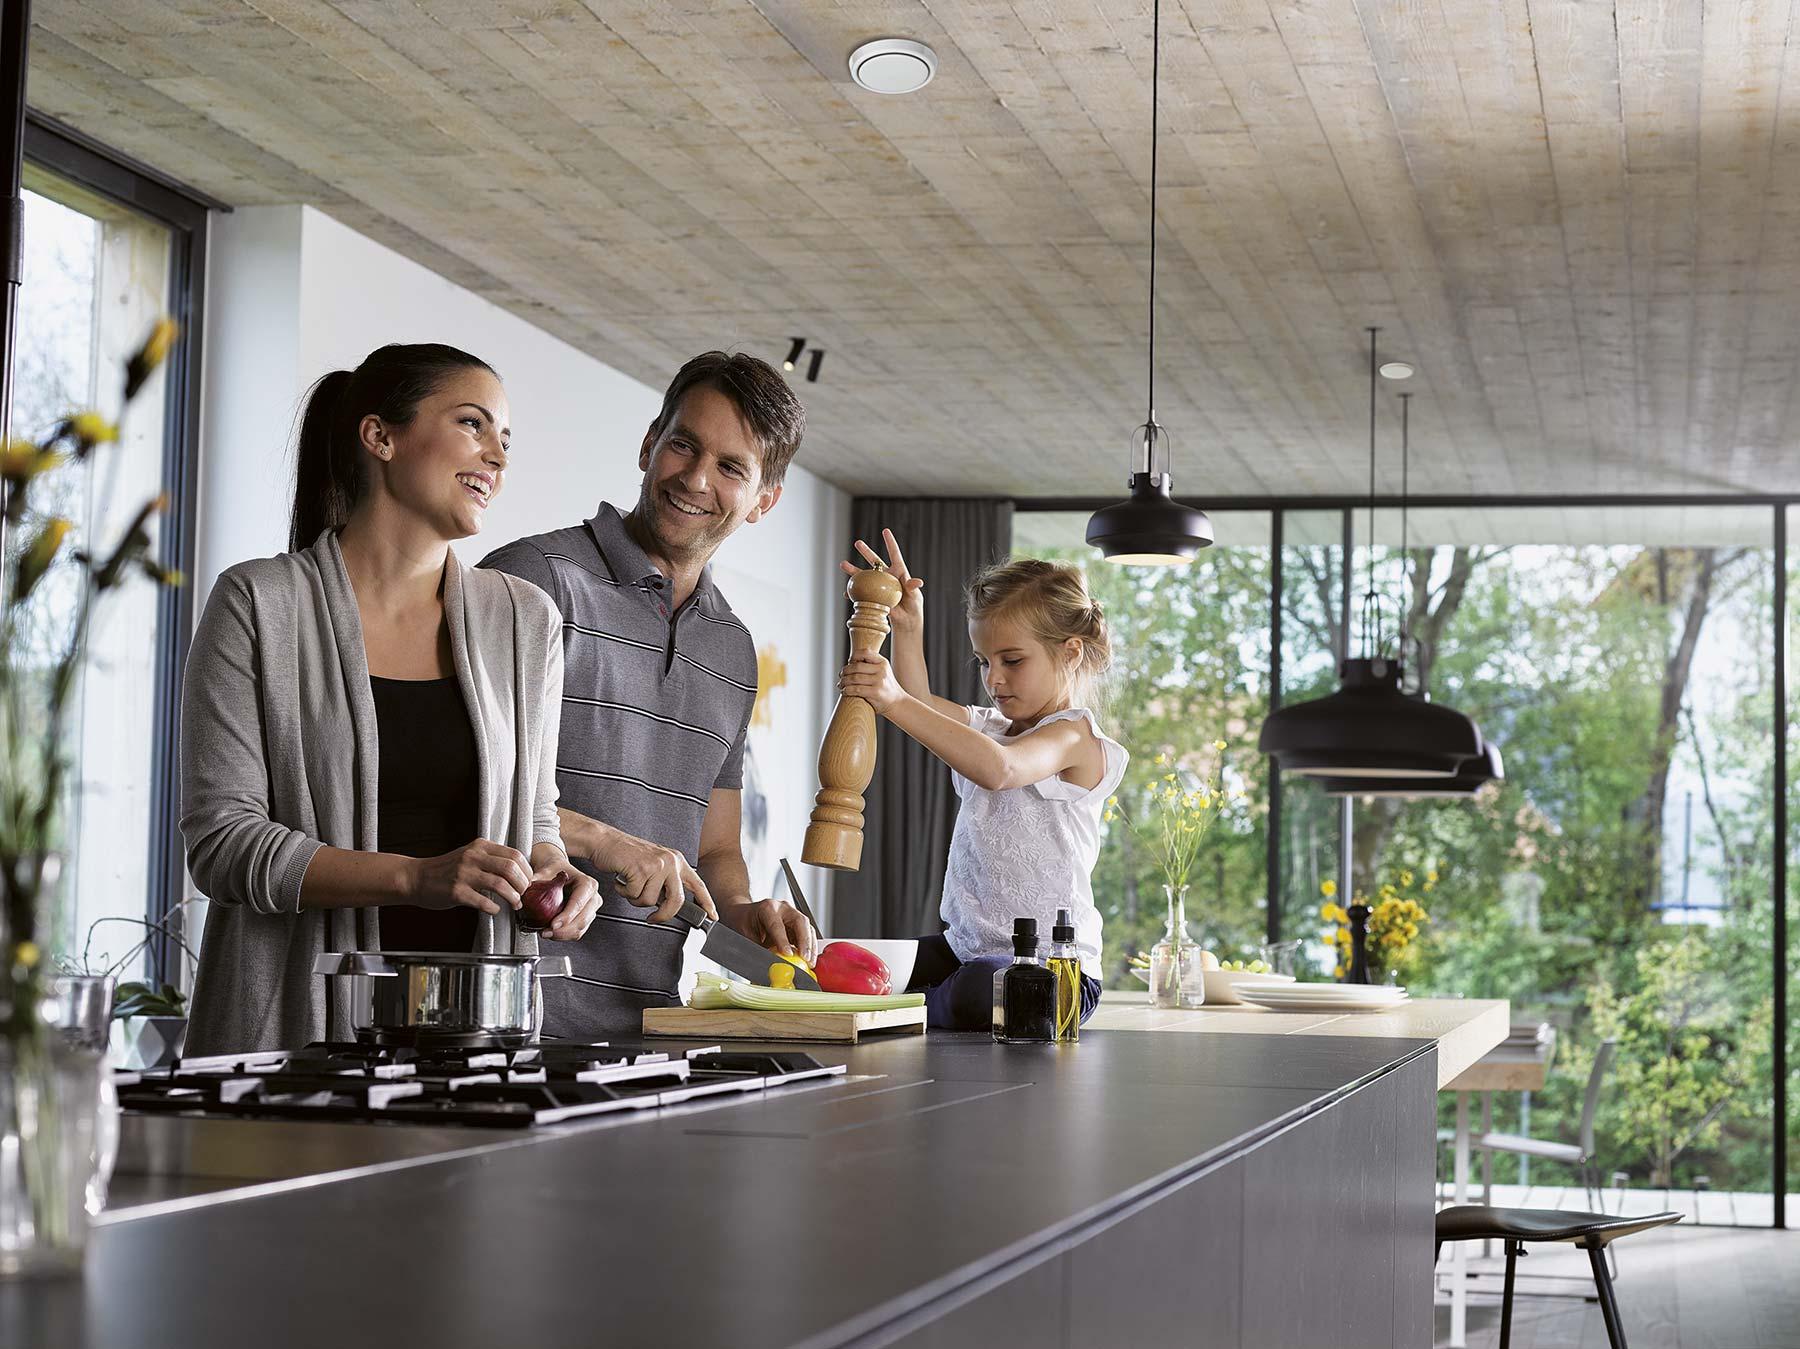 Žena, muž a holčička v kuchyni.